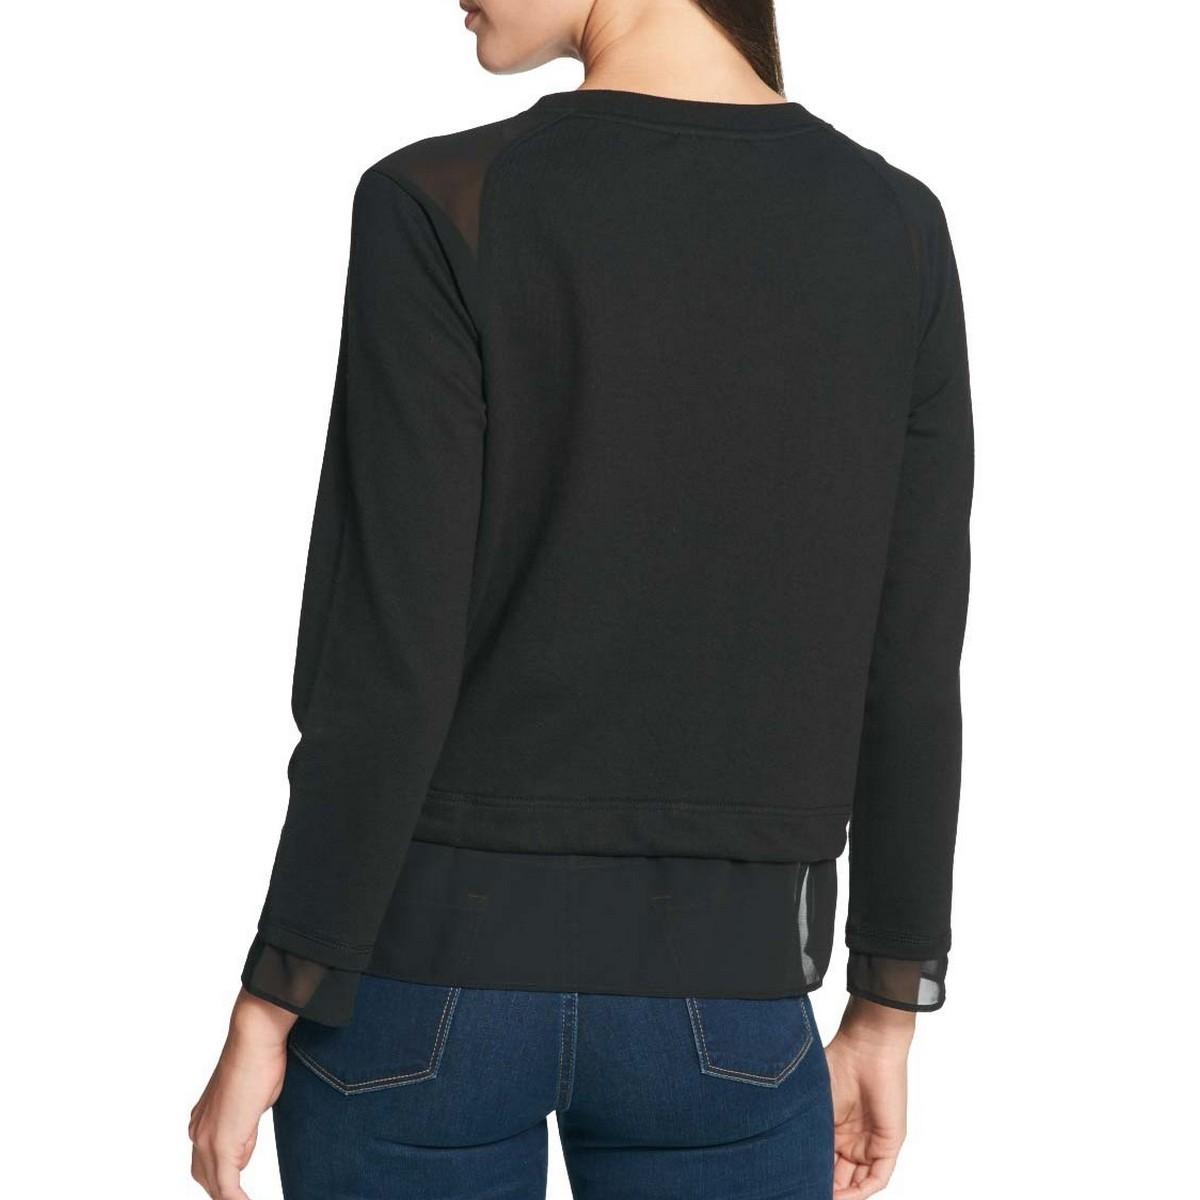 TOMMY-HILFIGER-Women-039-s-Layered-look-Sheer-Trim-Logo-Sweatshirt-Top-TEDO thumbnail 4